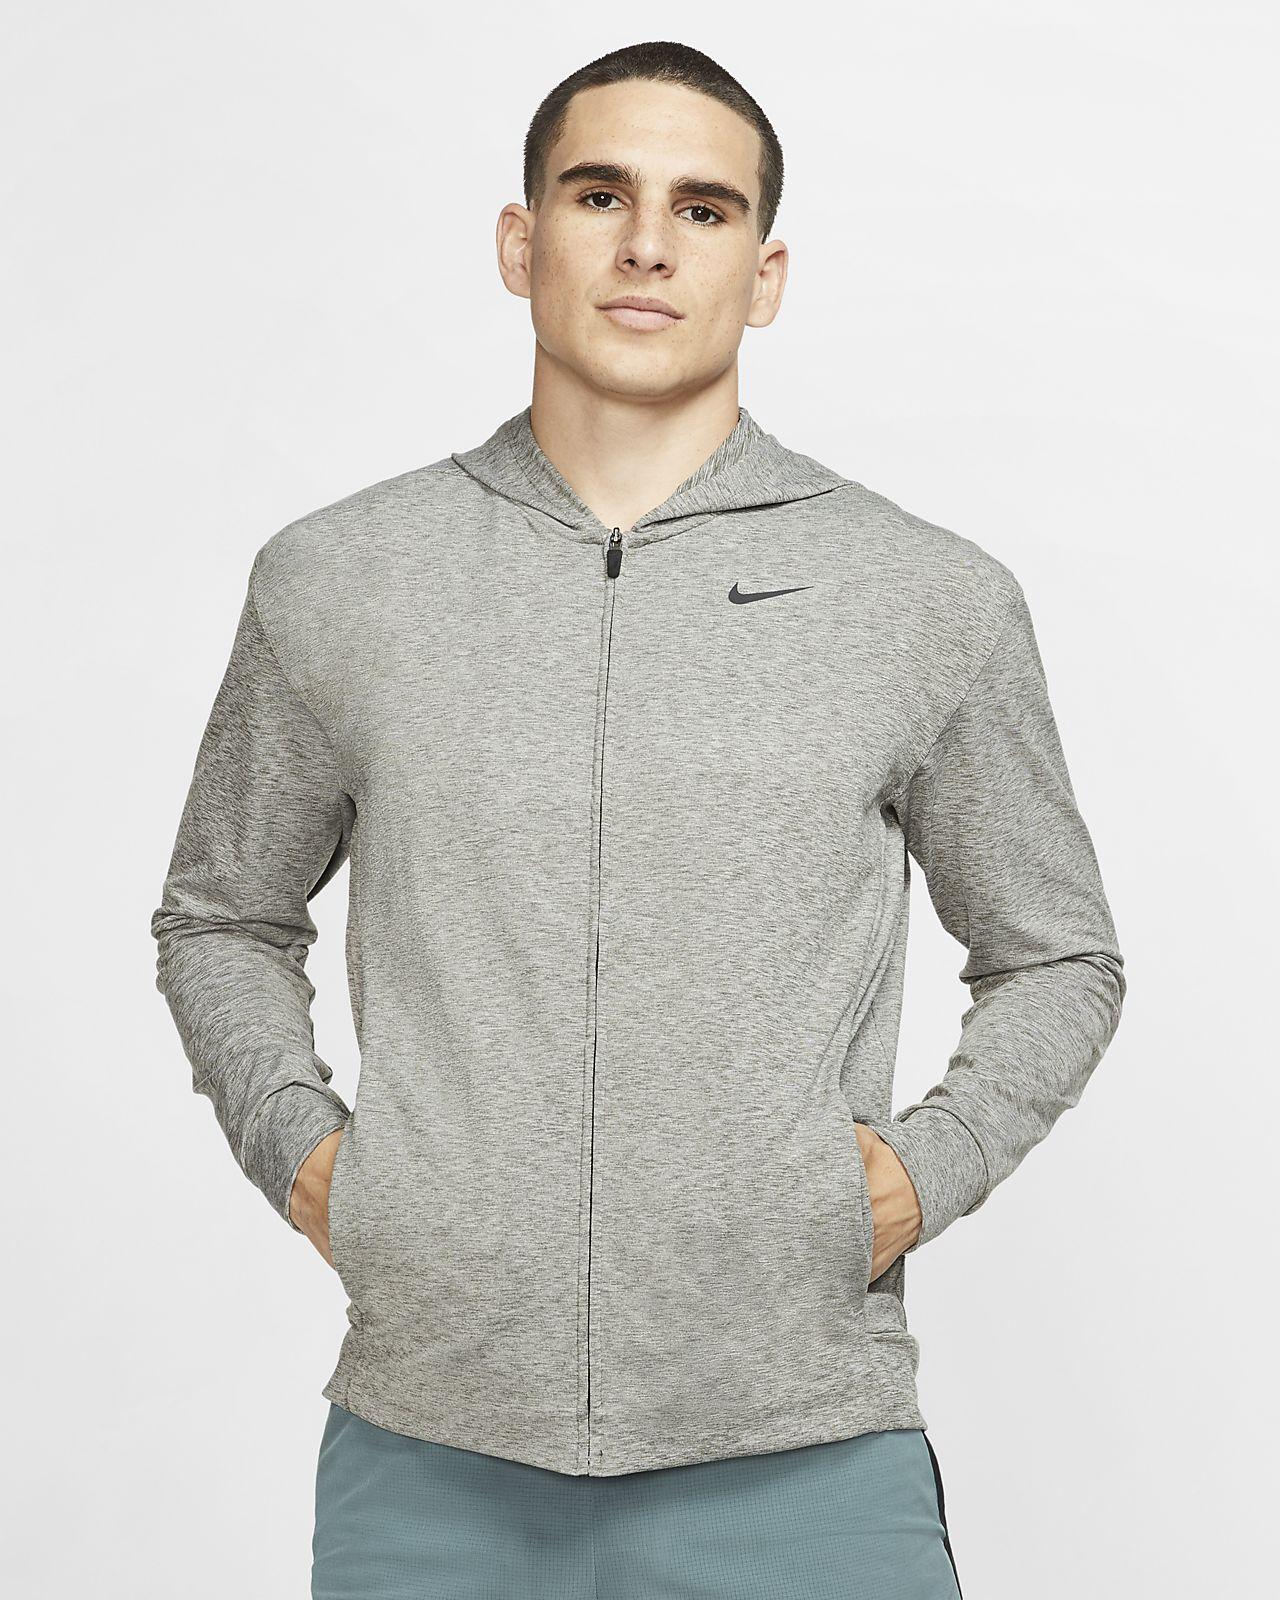 Męska rozpinana bluza treningowa z kapturem do jogi Nike Dri-FIT